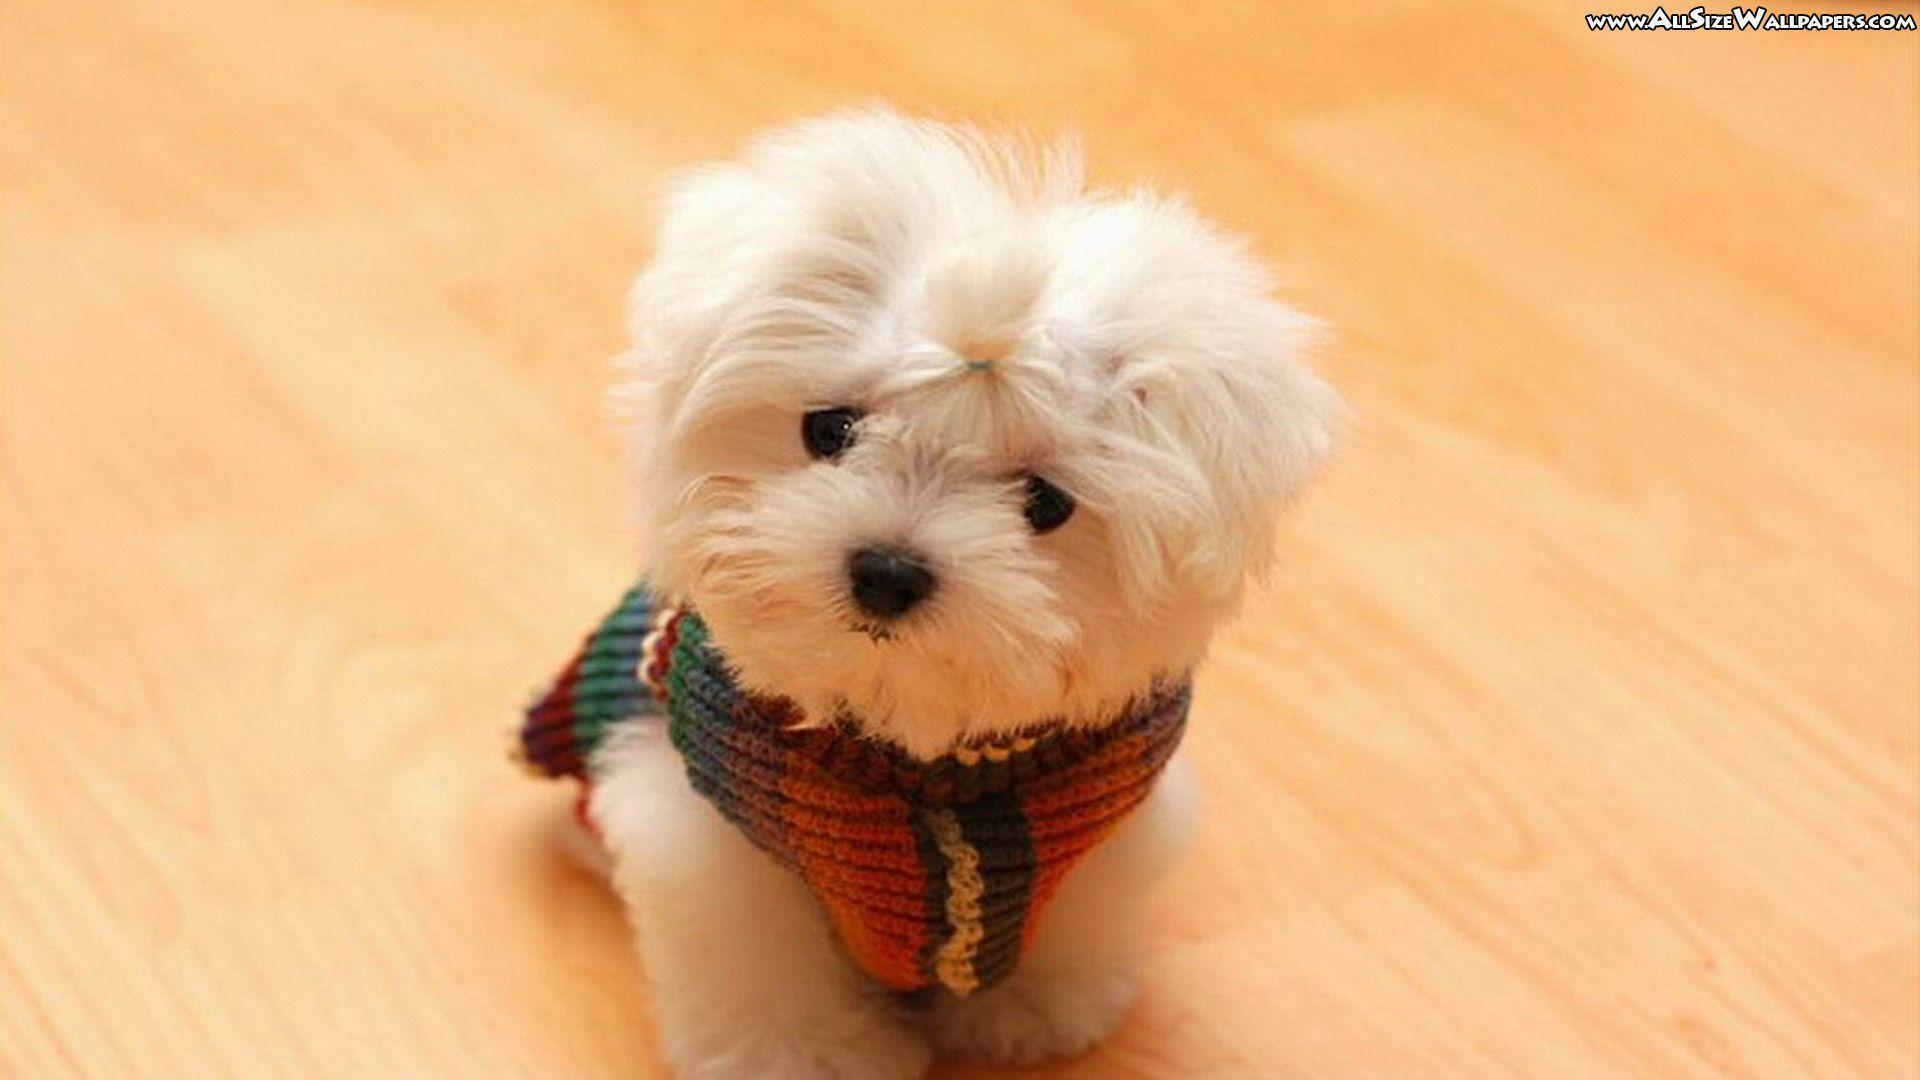 So cute puppies wallpaper 15897245 fanpop - Cute Puppy Wallpapers Wallpaper 1920x1080px Wallpaper Cute Puppy